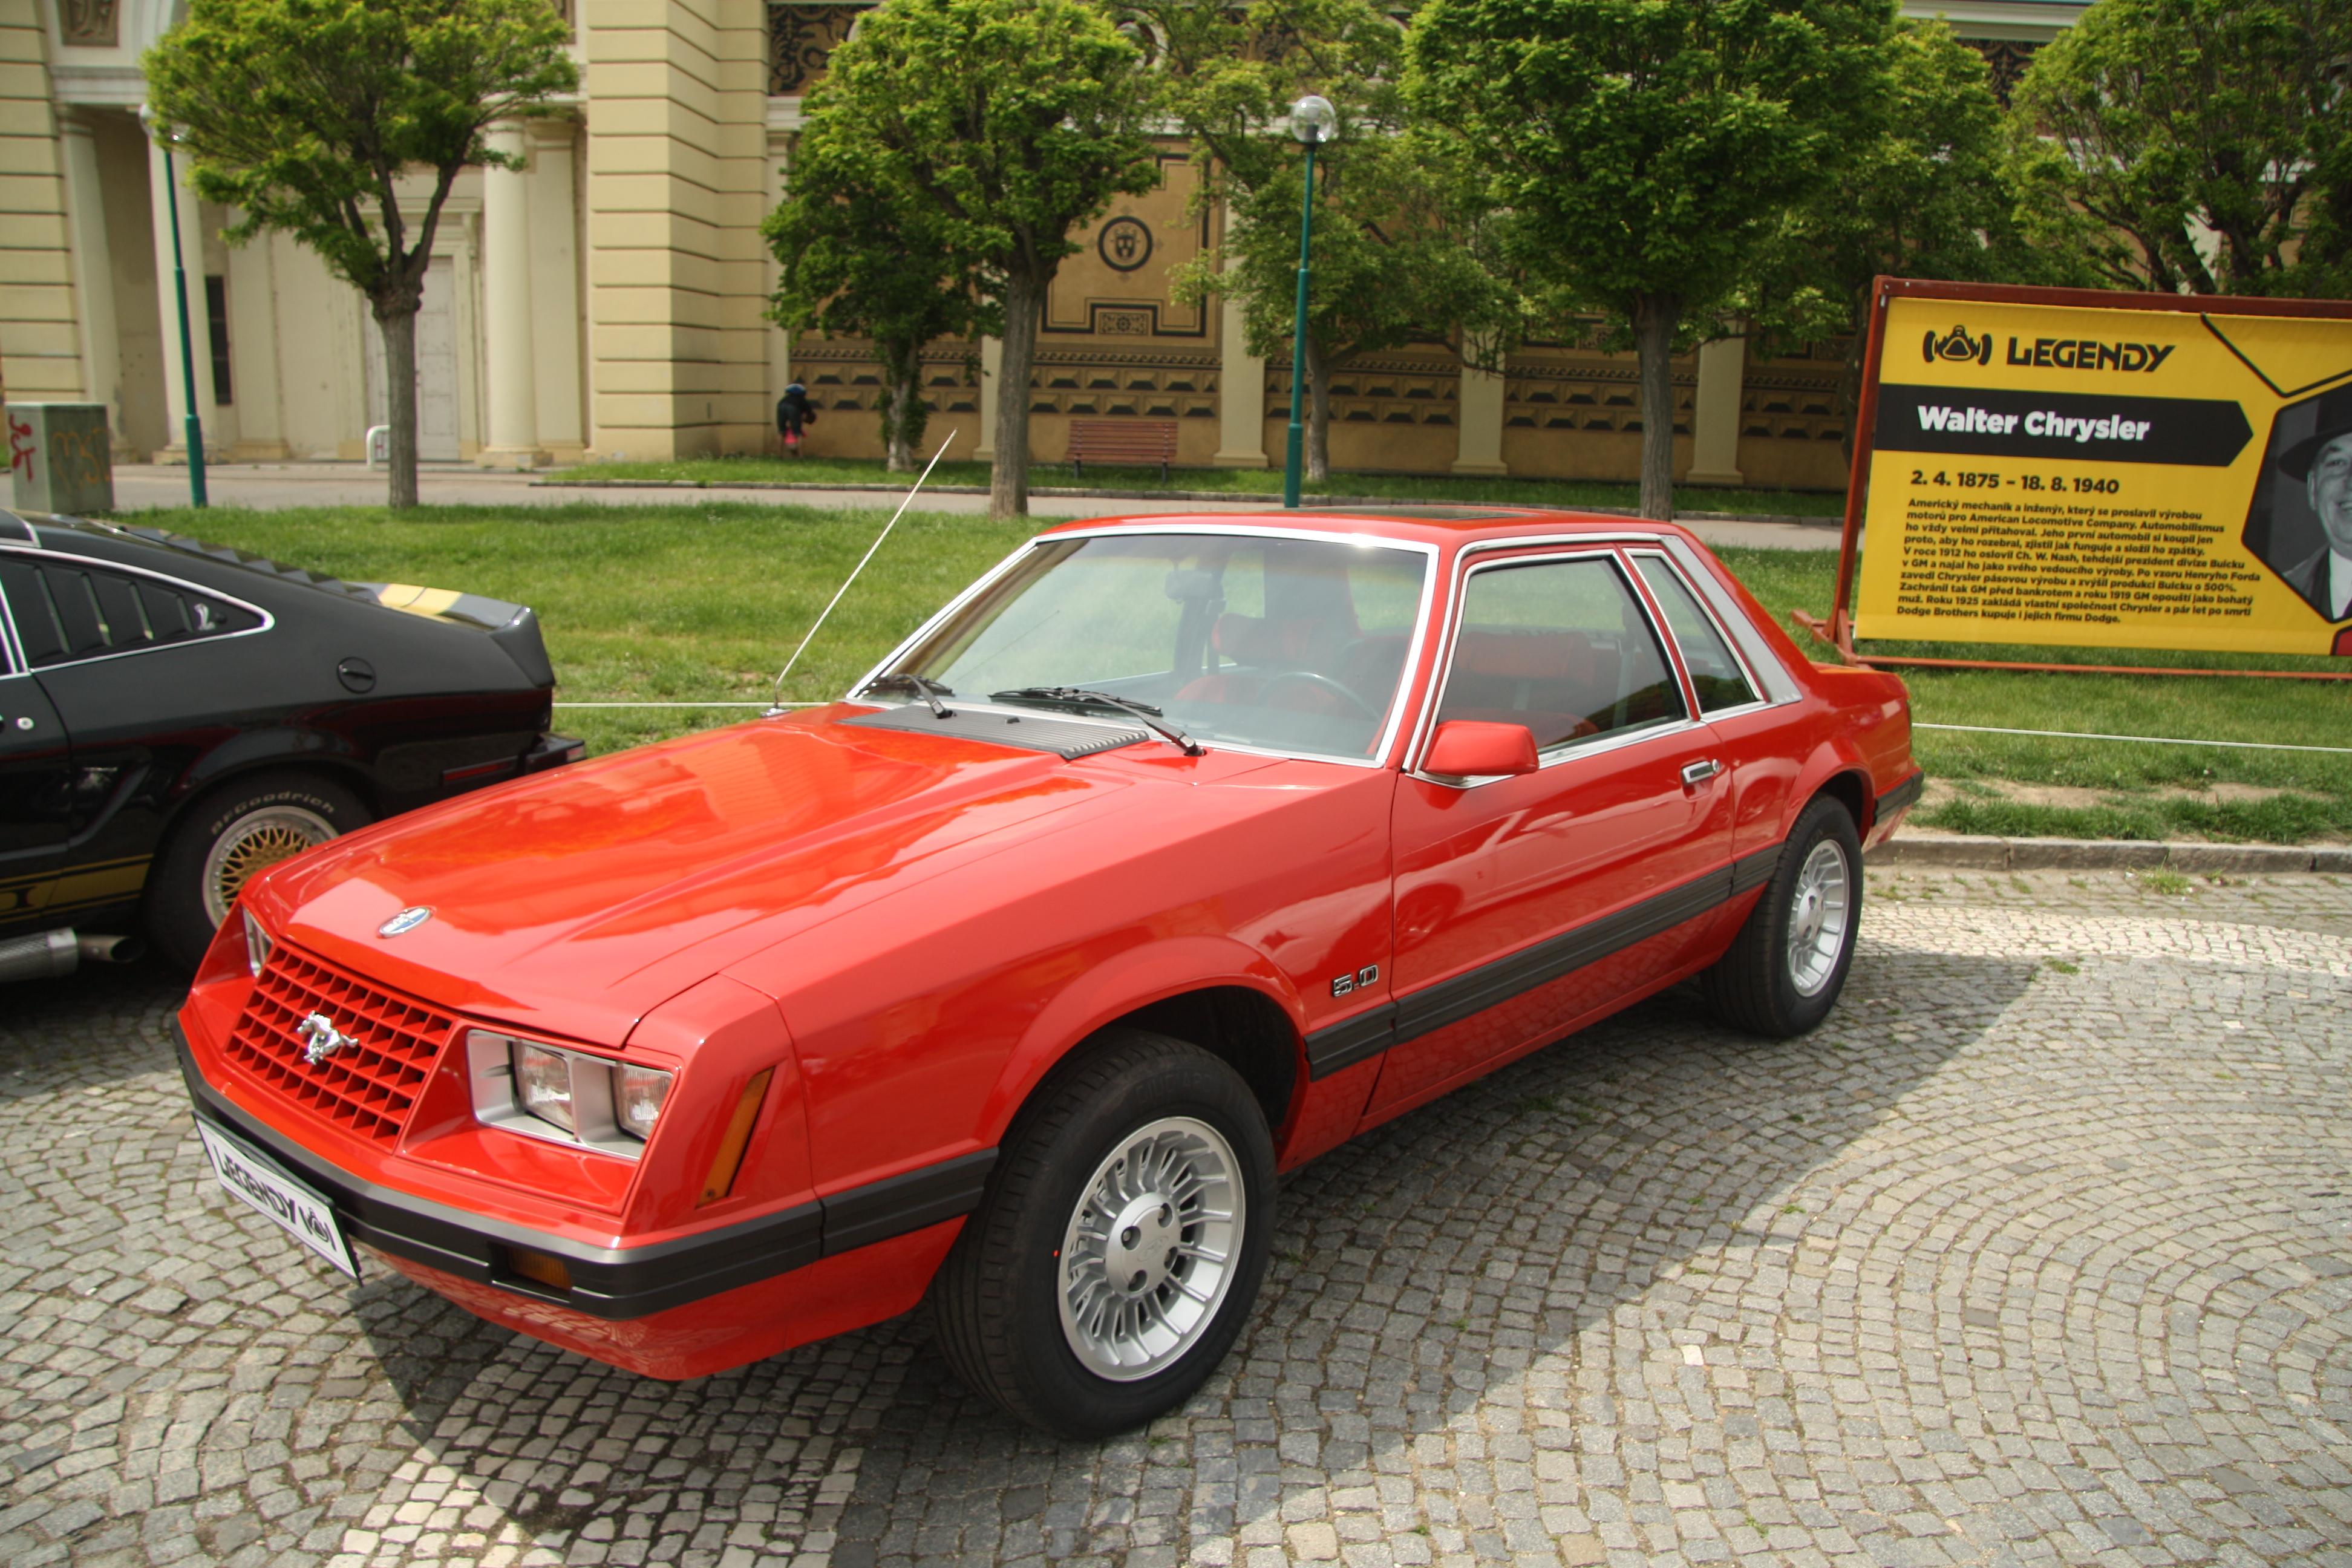 1979 FORD MUSTANG CAPRI THUNDERBIRD COUGAR GT 302 5.0L 5.0 ENGINE BELT DECAL